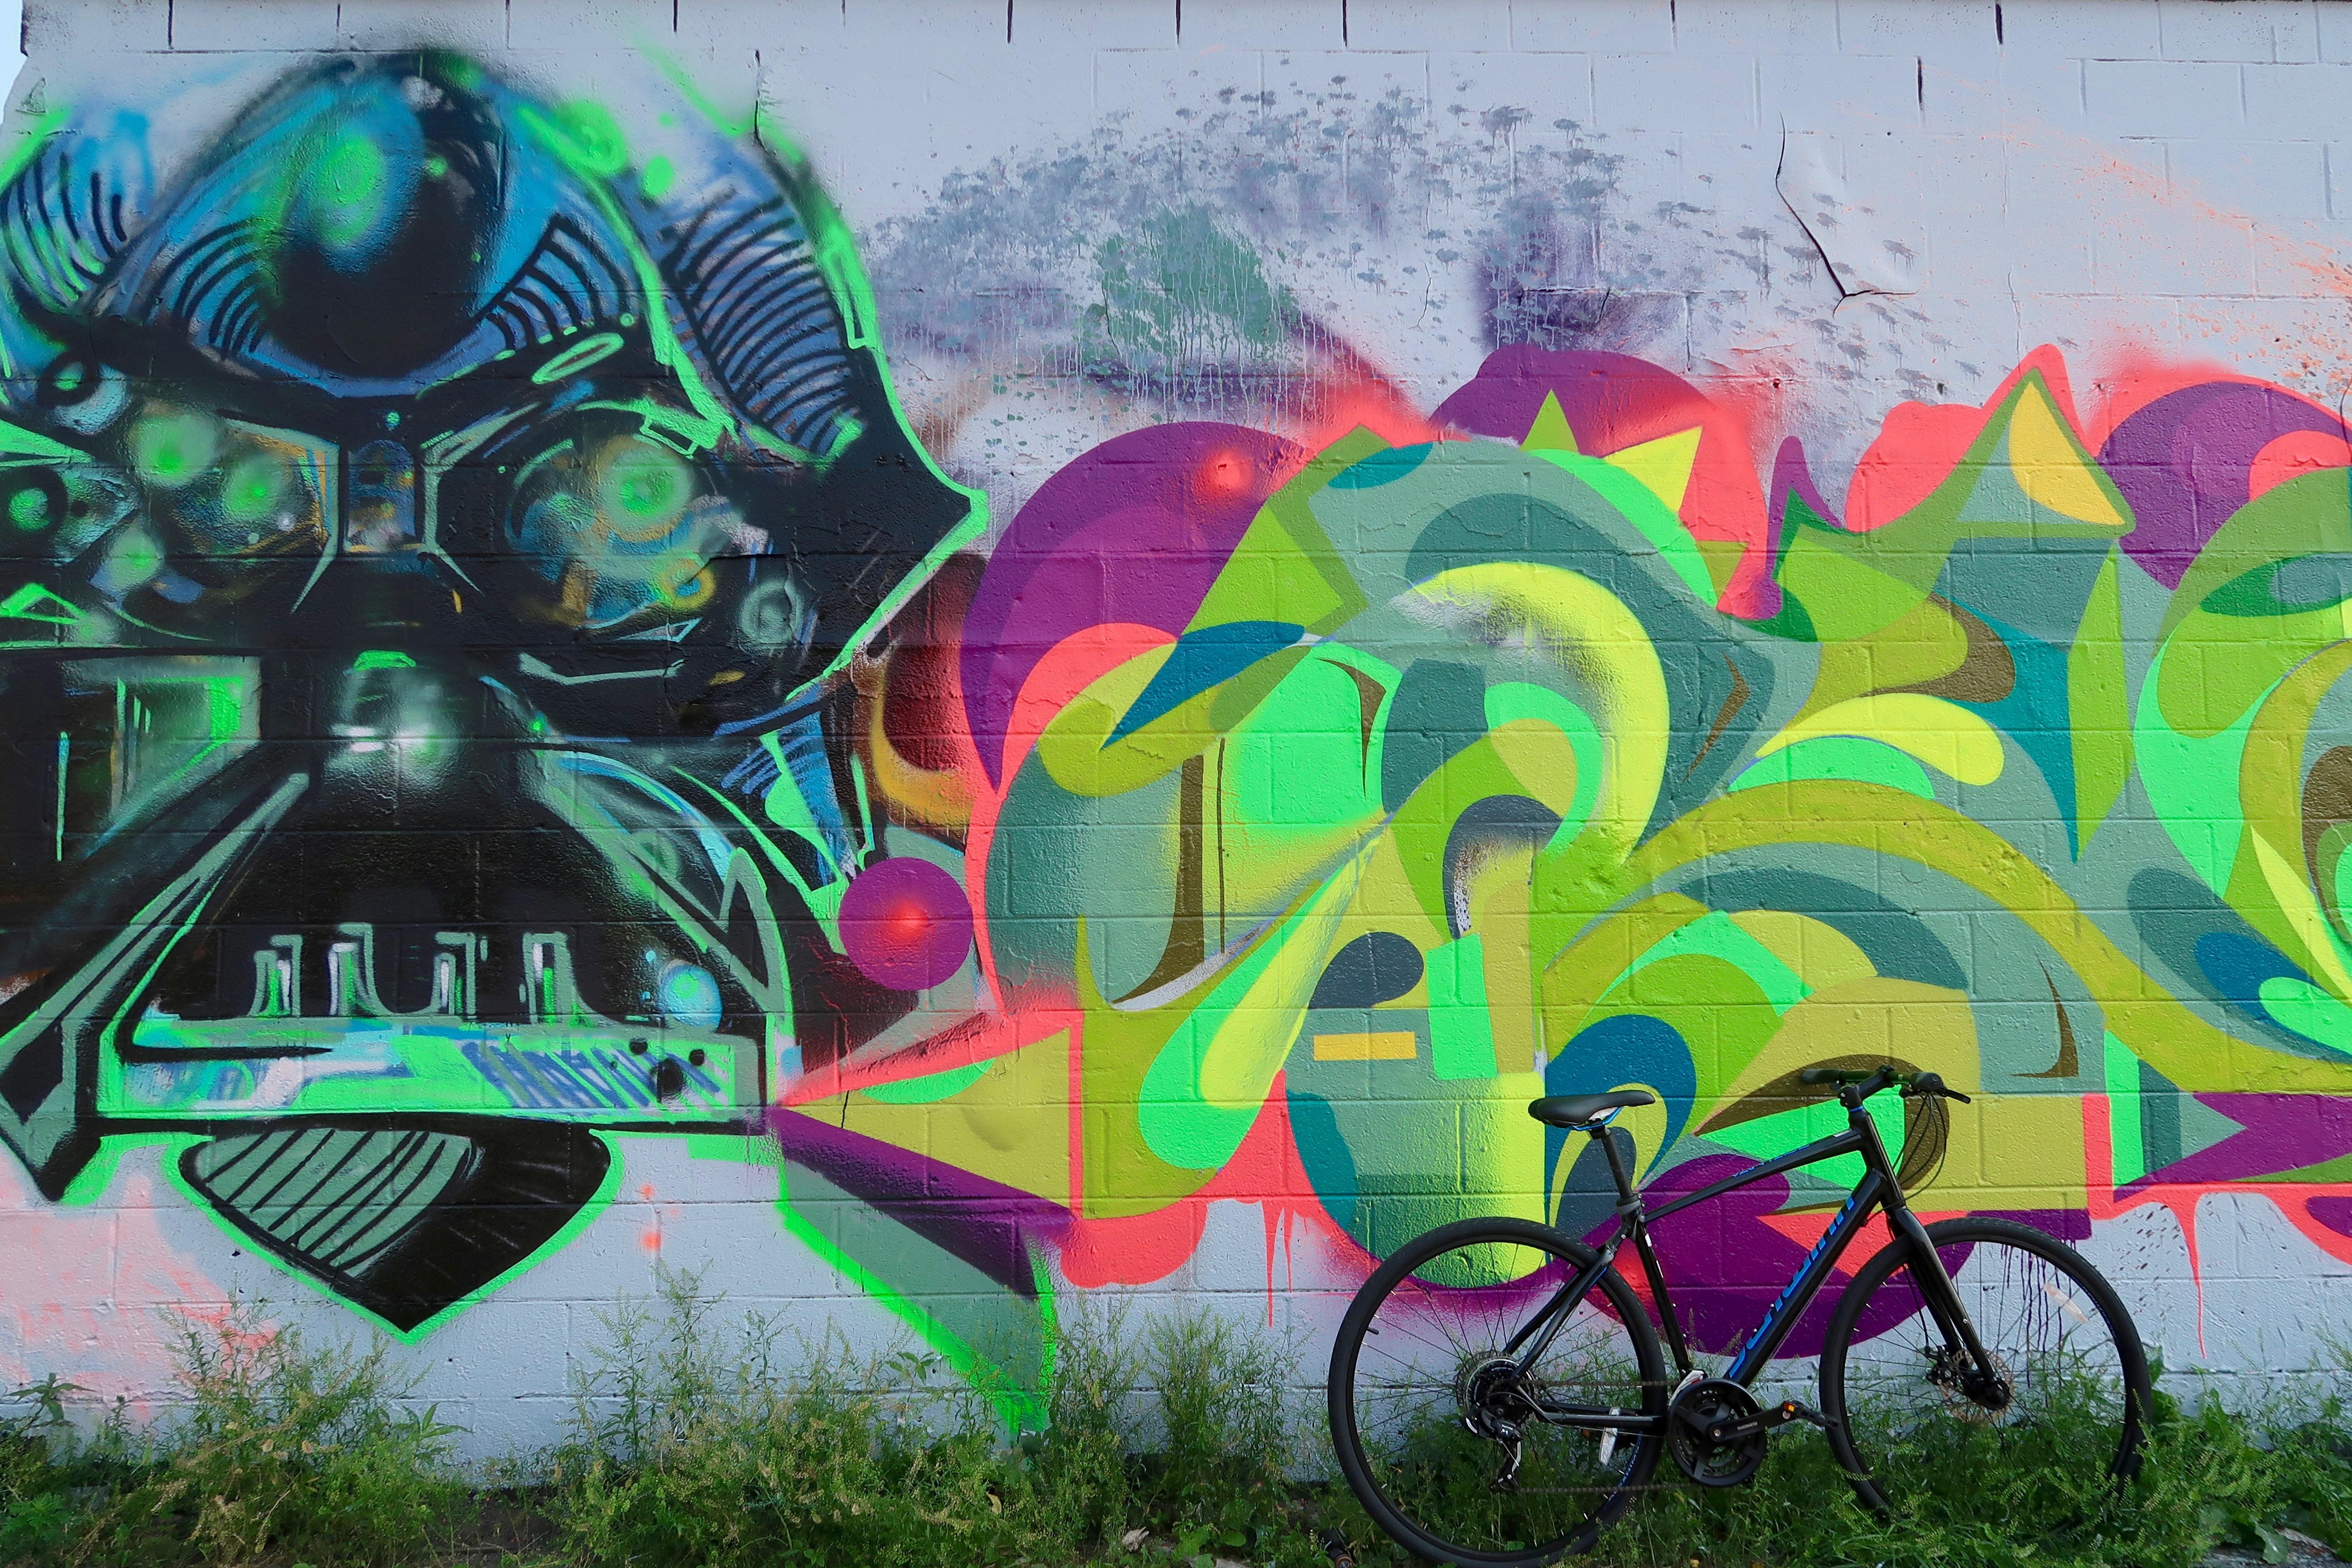 Fullerton Graffiti Wall Logan Square Chicago